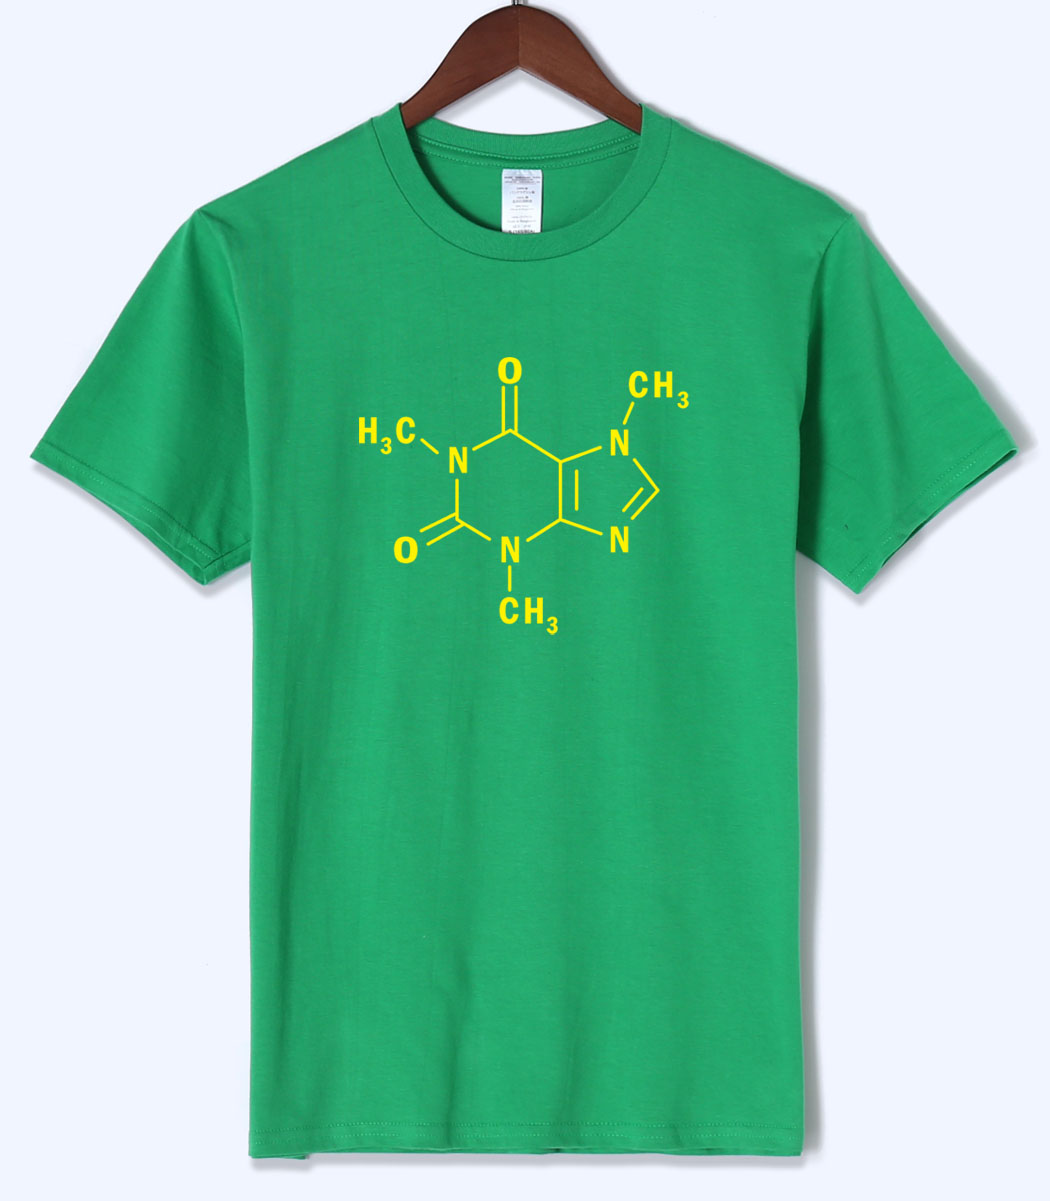 Cotton Short Sleeve O-neck Tshirt Science Adult The Big Bang Theory Sheldon Mens T Shirts 2018 Summer Men Slim Fit T Shirts Tees